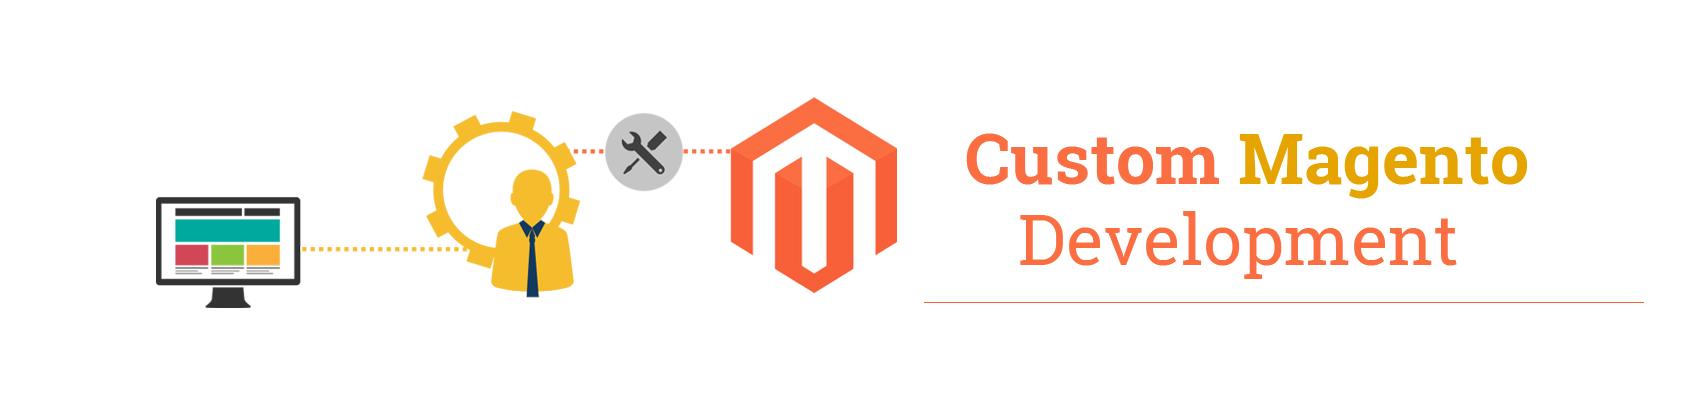 How Can Custom Magento Development Help E-Commerce Stores Fare Better